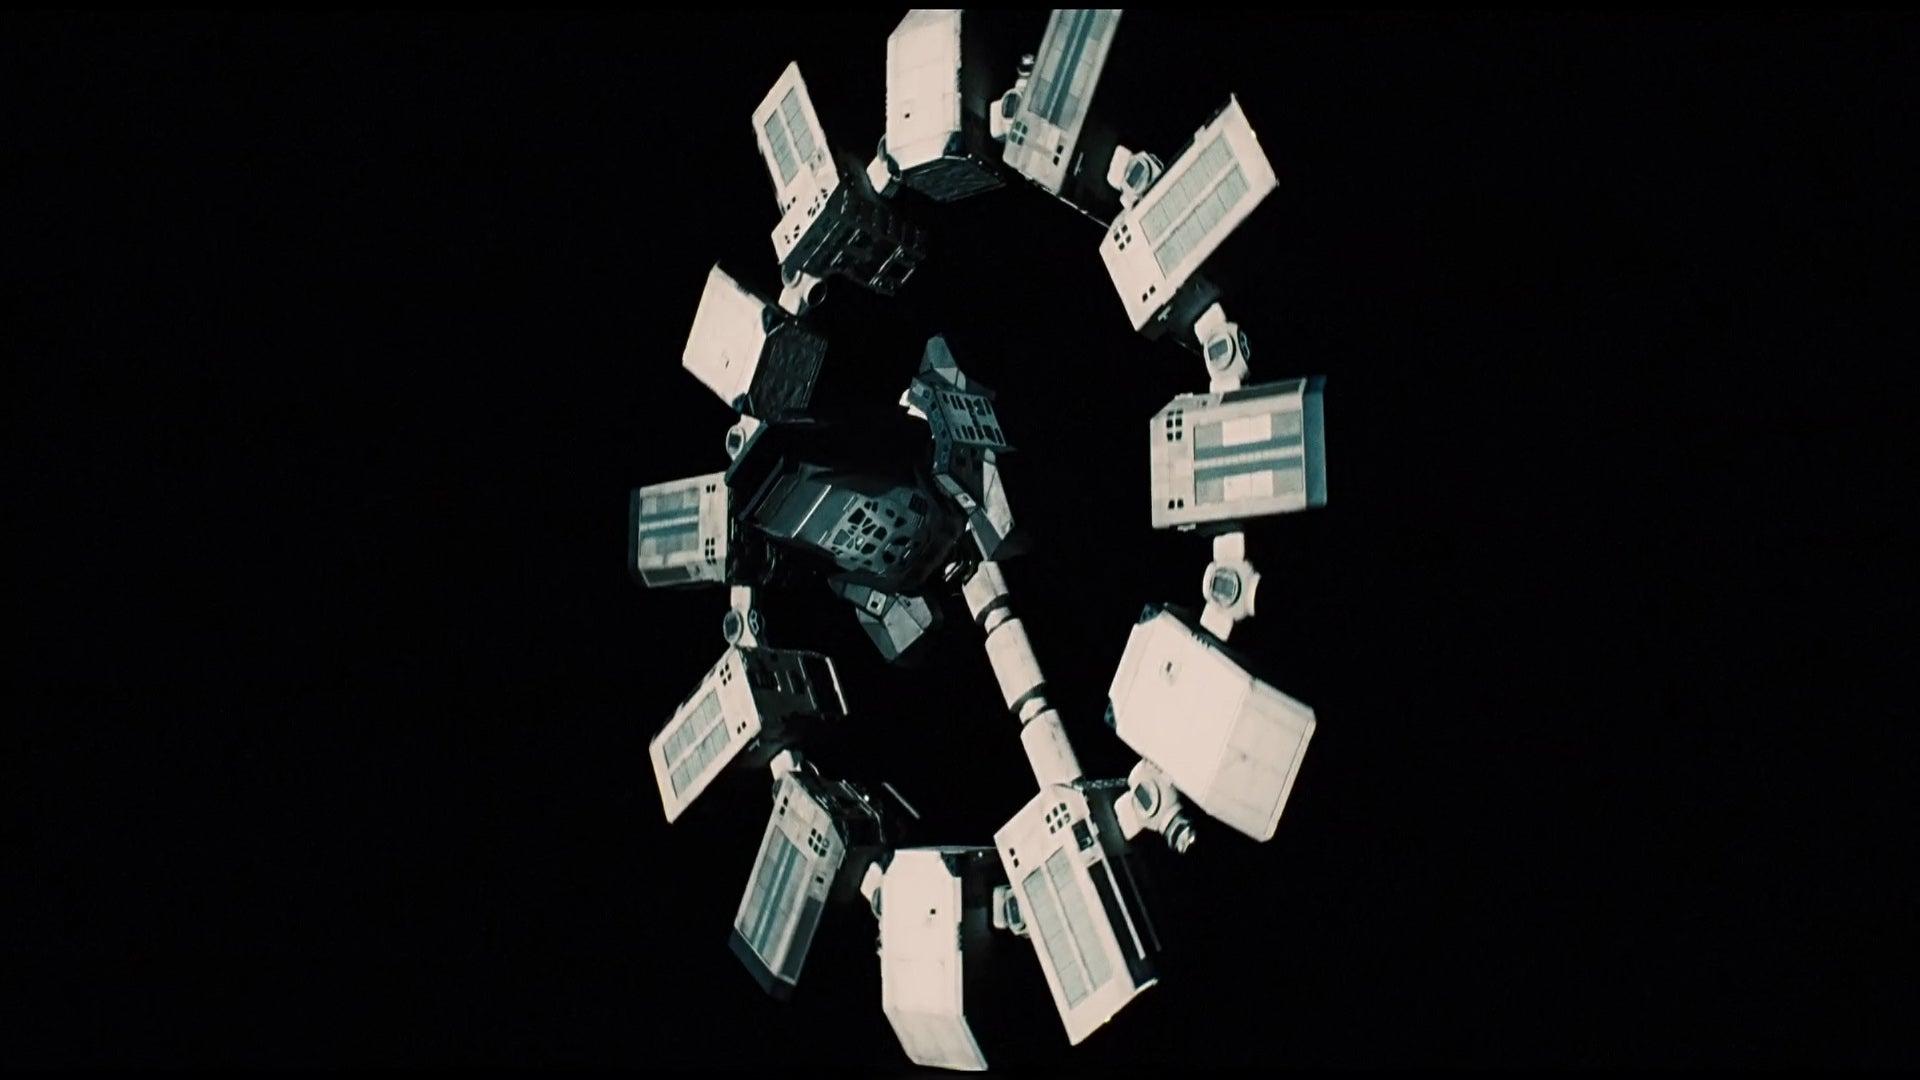 Interstellar Nolan Wallpaper For Interstellar We're